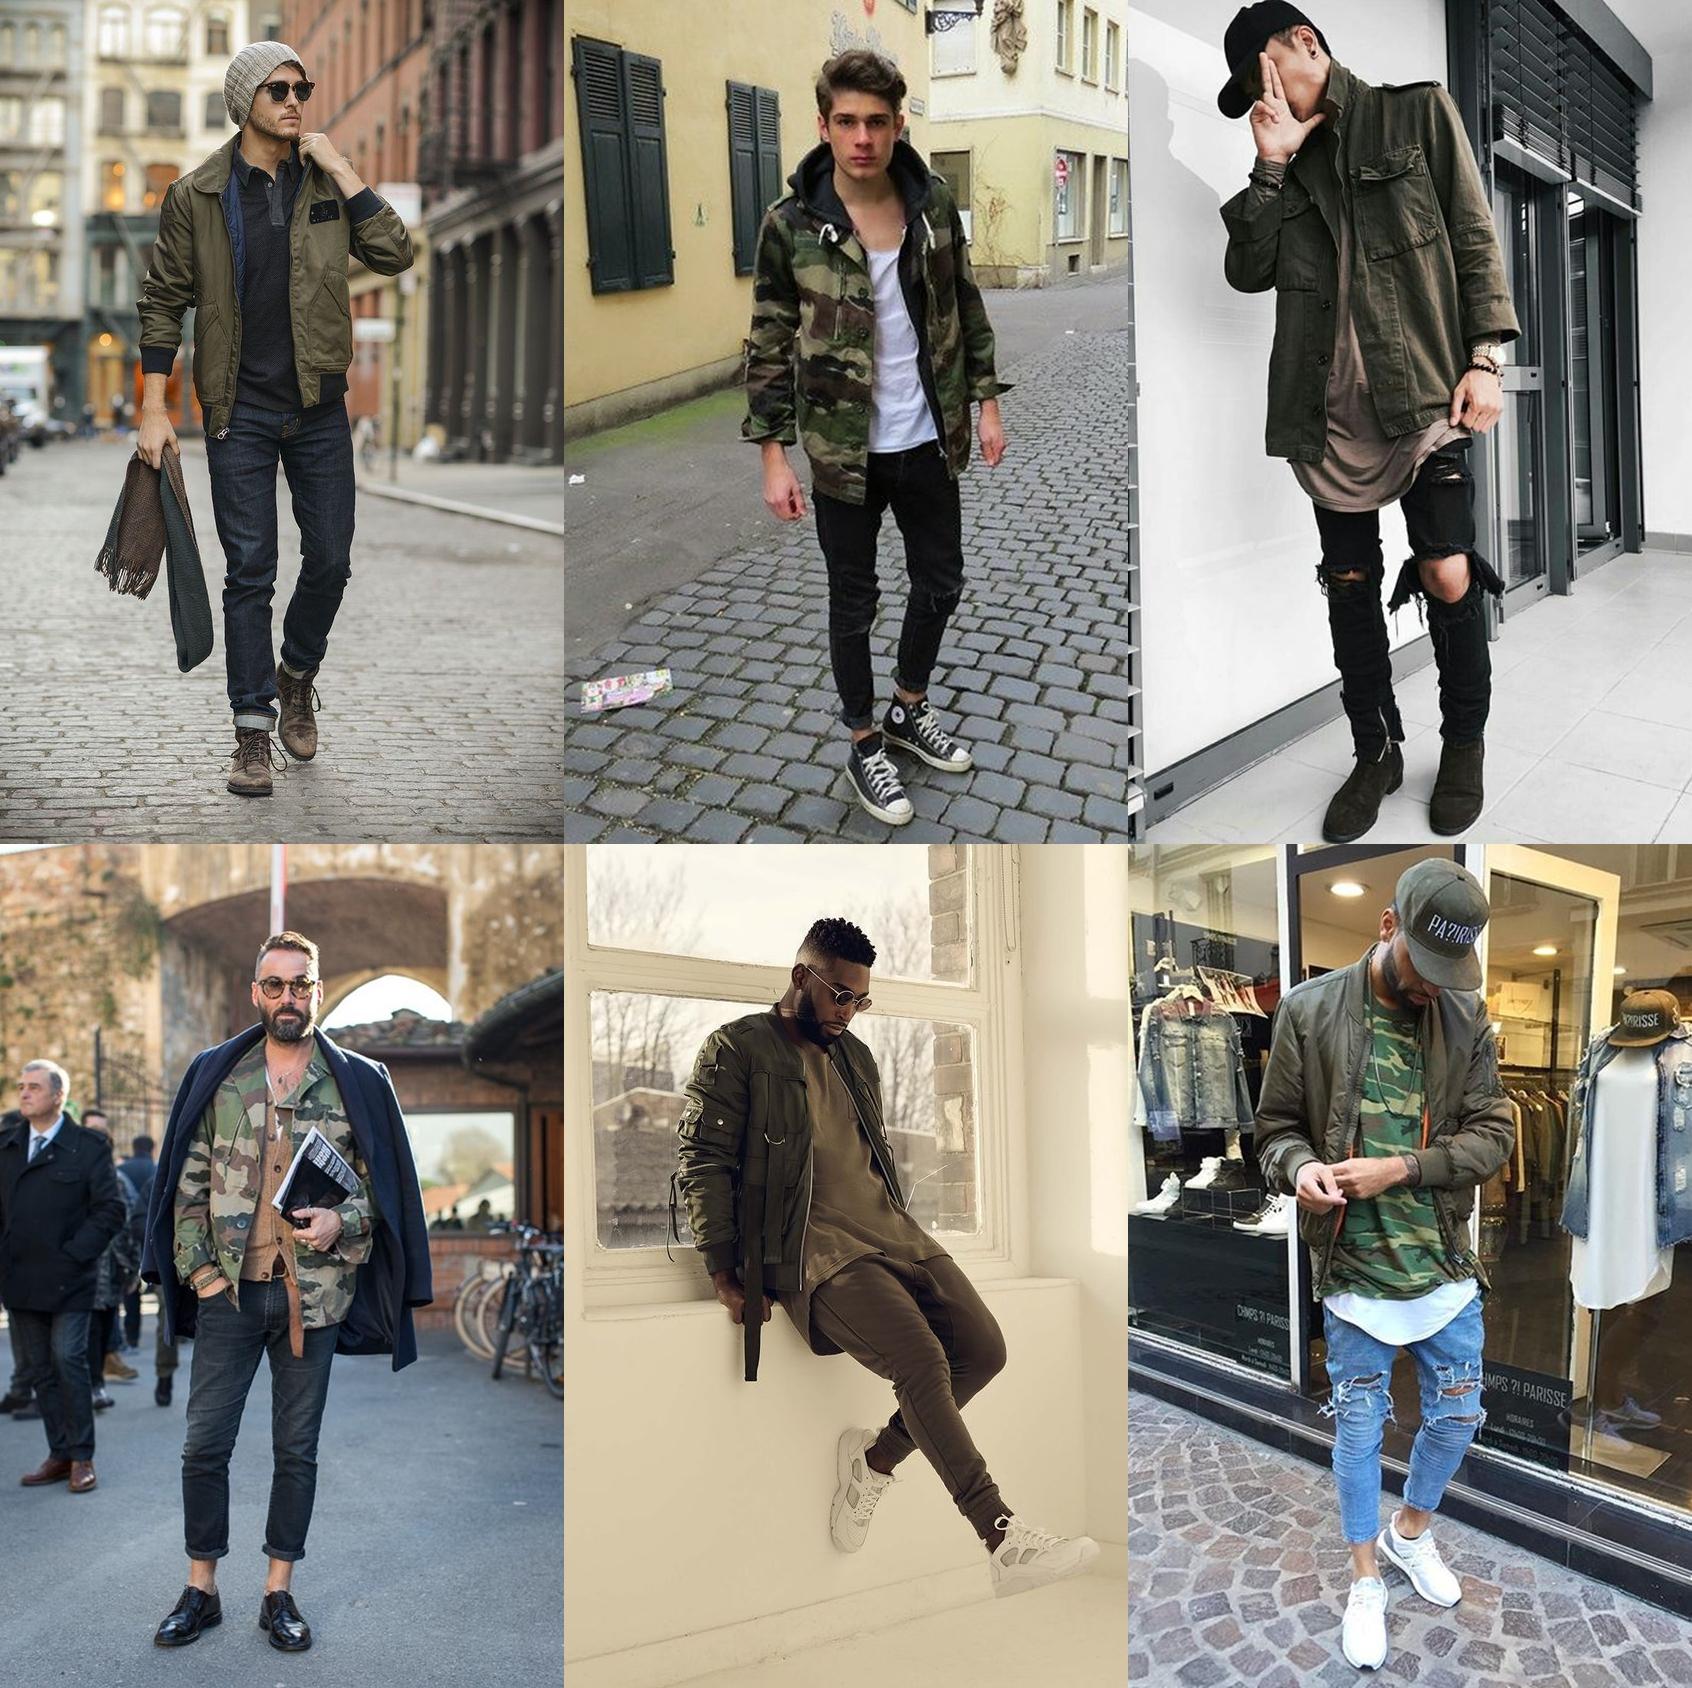 tendencia de moda masculina 2017, tendencia masculina inverno 2017, look masculino 2017, roupa masculina, estilo masculino, blog de moda masculina, moda sem censura, alex cursino, 2